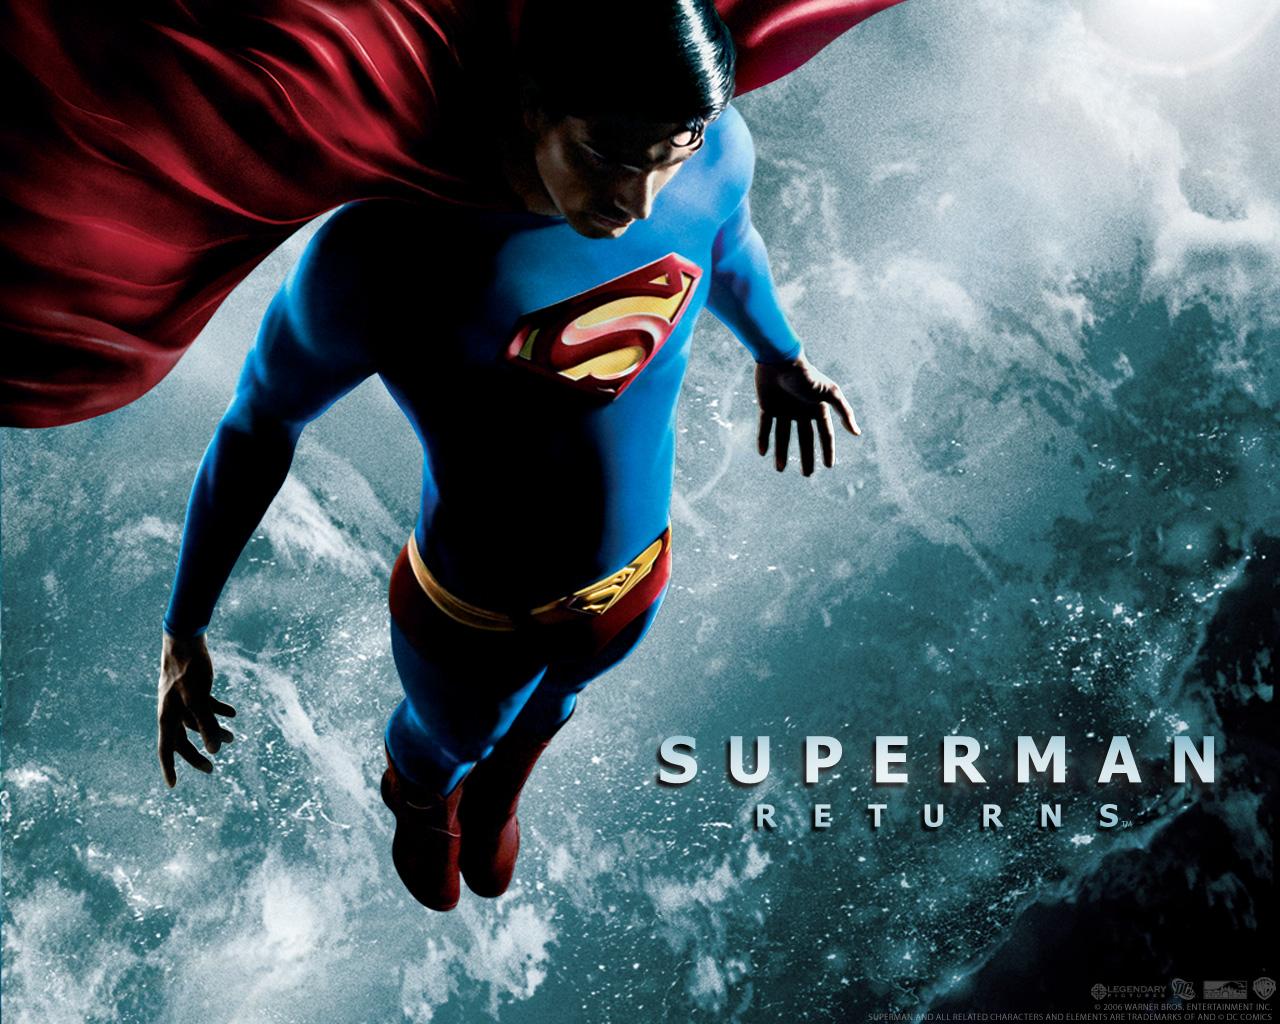 Superman005 1280x1024